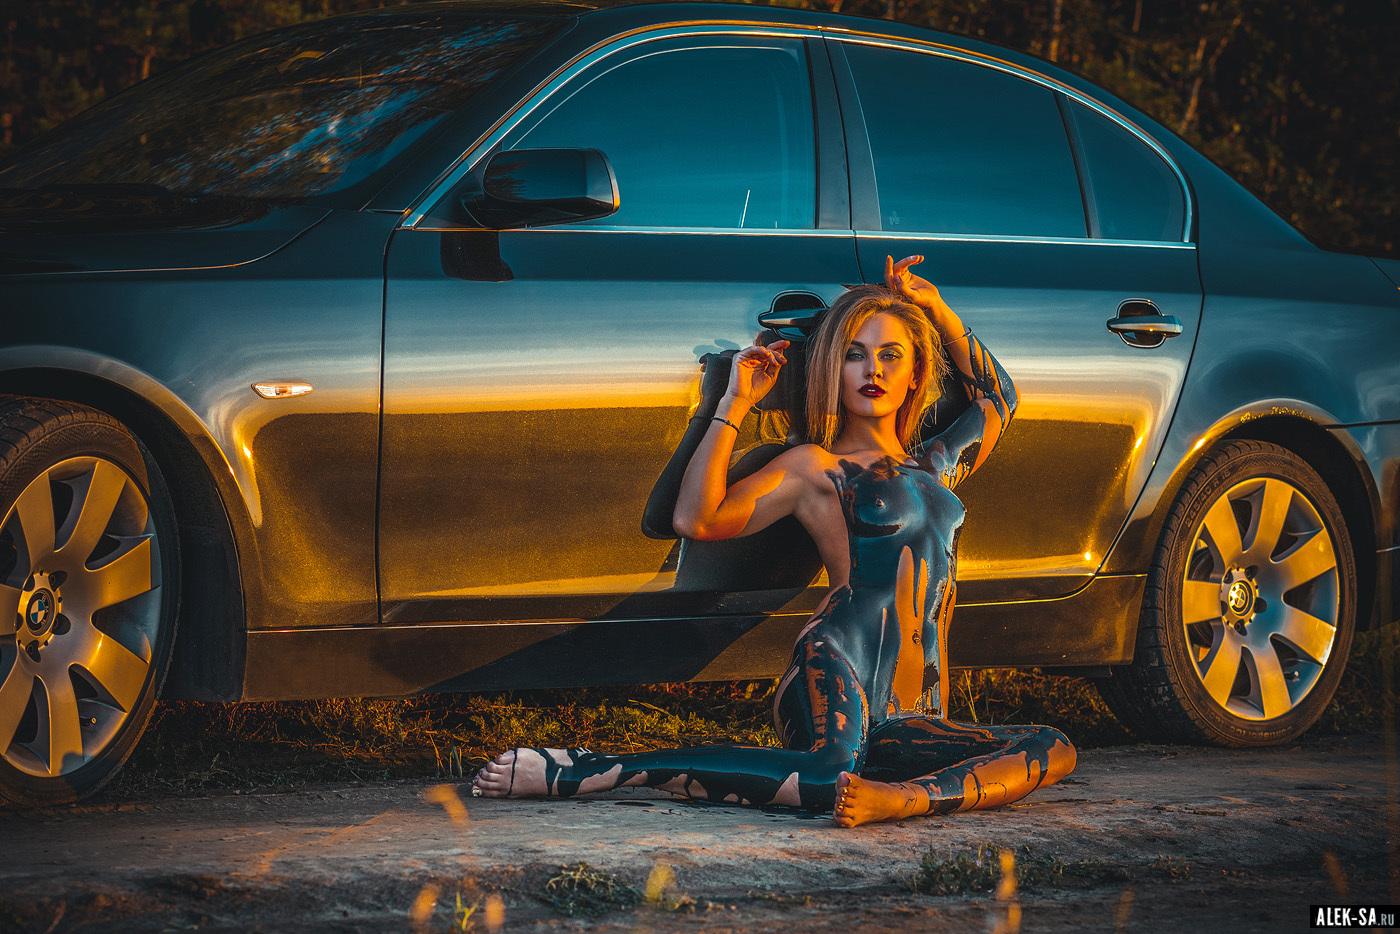 Девушки и авто эротика автоэротика порно